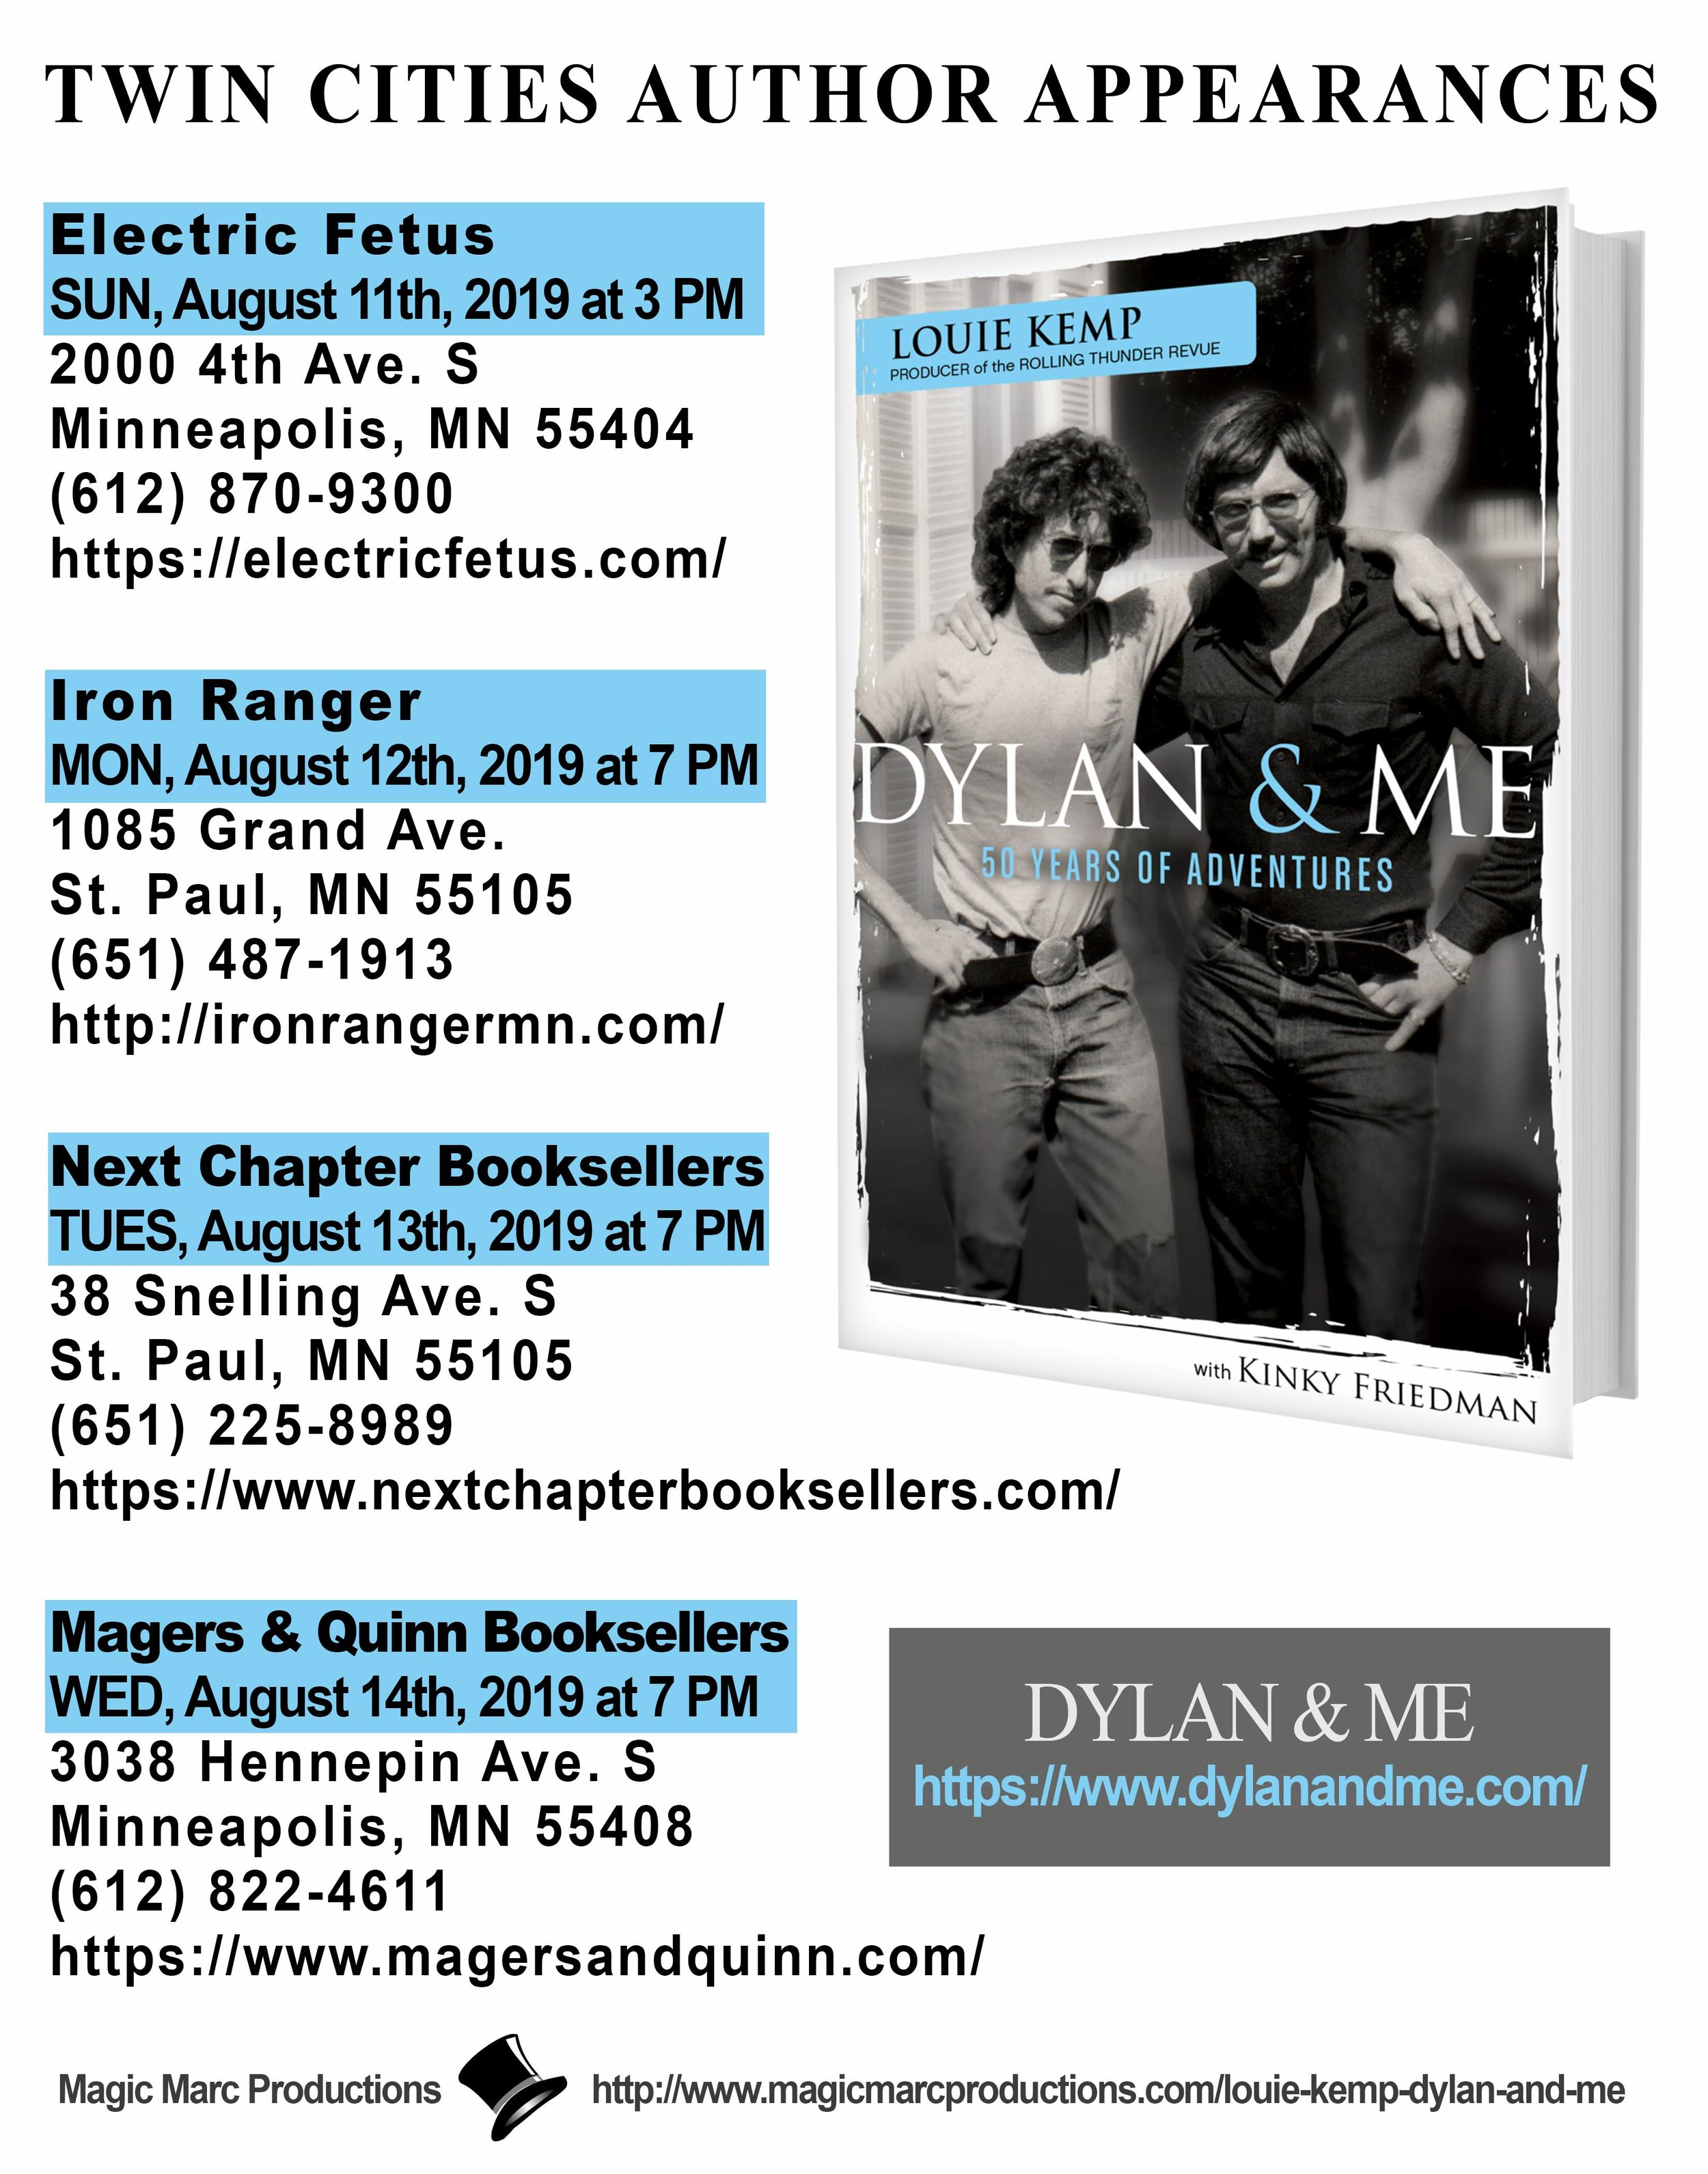 LOUIE KEMP - DYLAN & ME - TWIN CITIES APPEARANCES.jpg